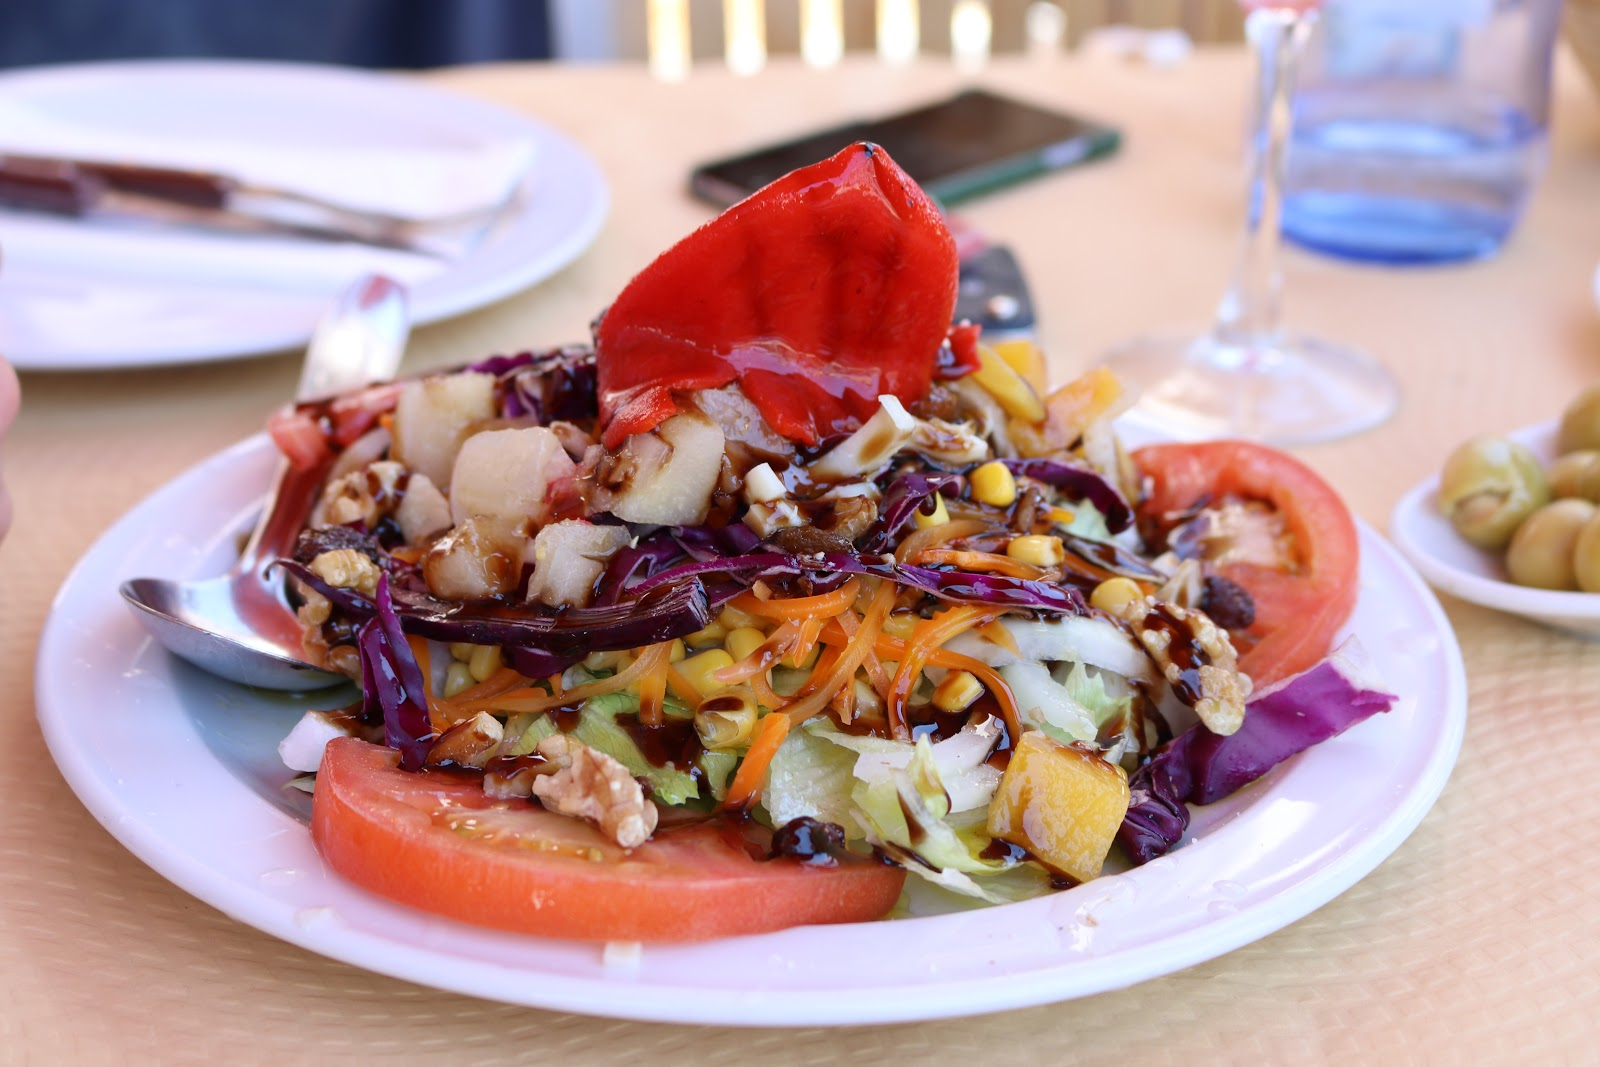 Plate of salad, spain